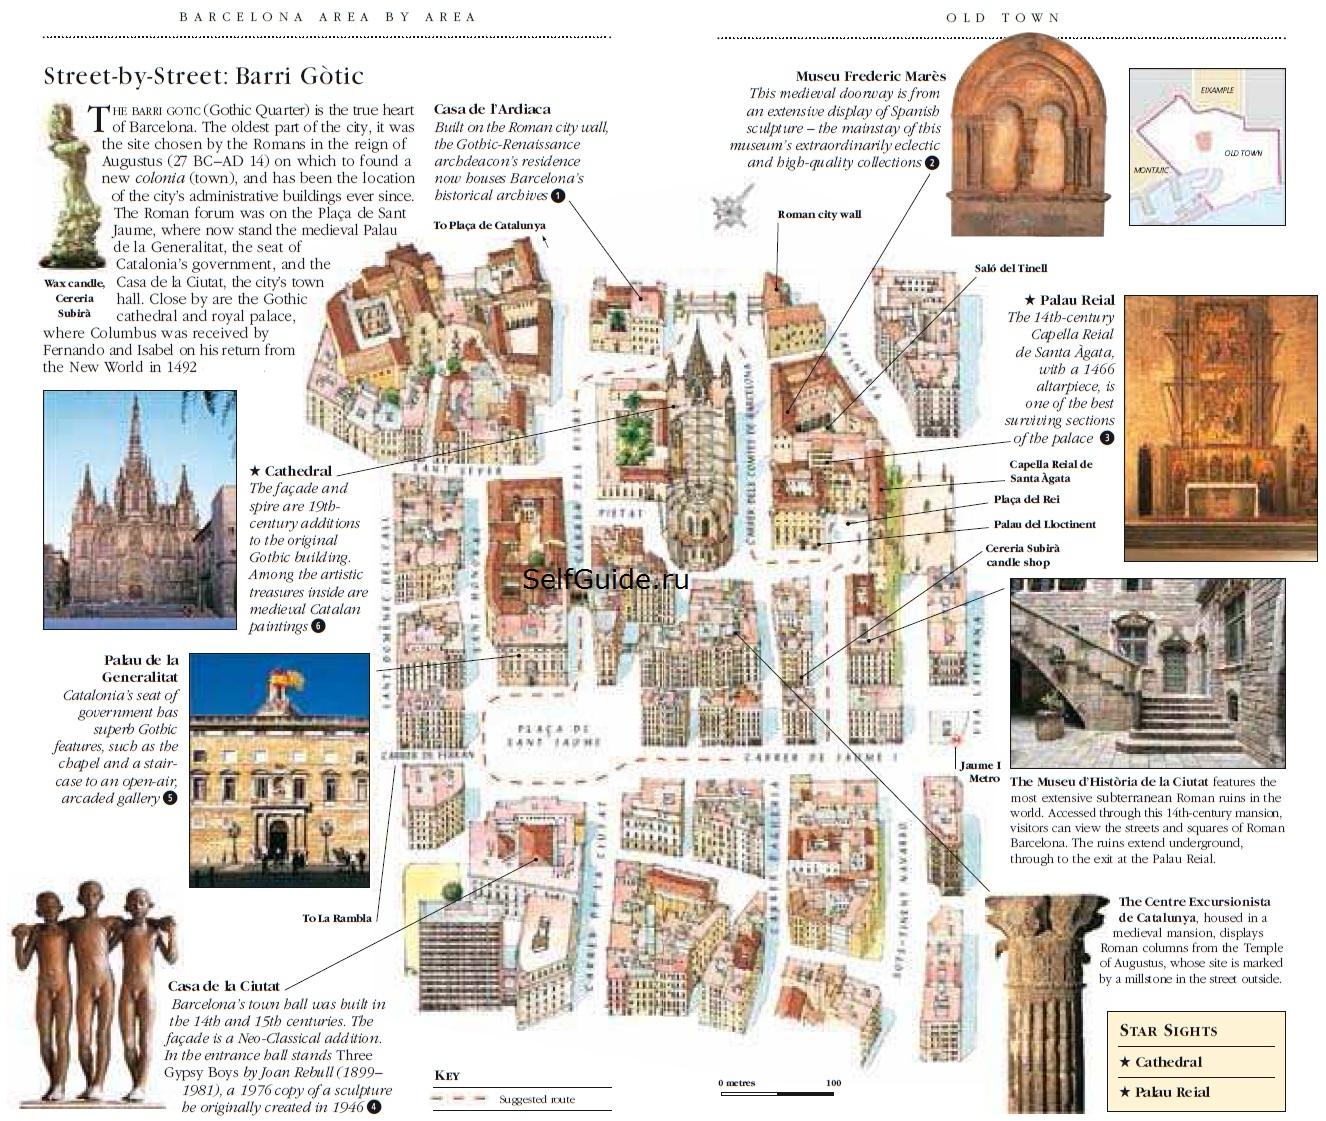 Маршрут: Готический квартал Барселоны с картой и описаниями, путеводитель по Барселоне, достопримечательности старого города Барселоны. Тематический тур по городу, по Барселоне, что посмотреть в Барселоне, прогулка по готическому кварталу Барселоны, старый город Барселоны, кафедральный собор, старые кварталы Барселоныб barri gotic barcelona gothic quarter what to see main sights walking tour suggested itineraries Barcelona Spain best travel guide free download